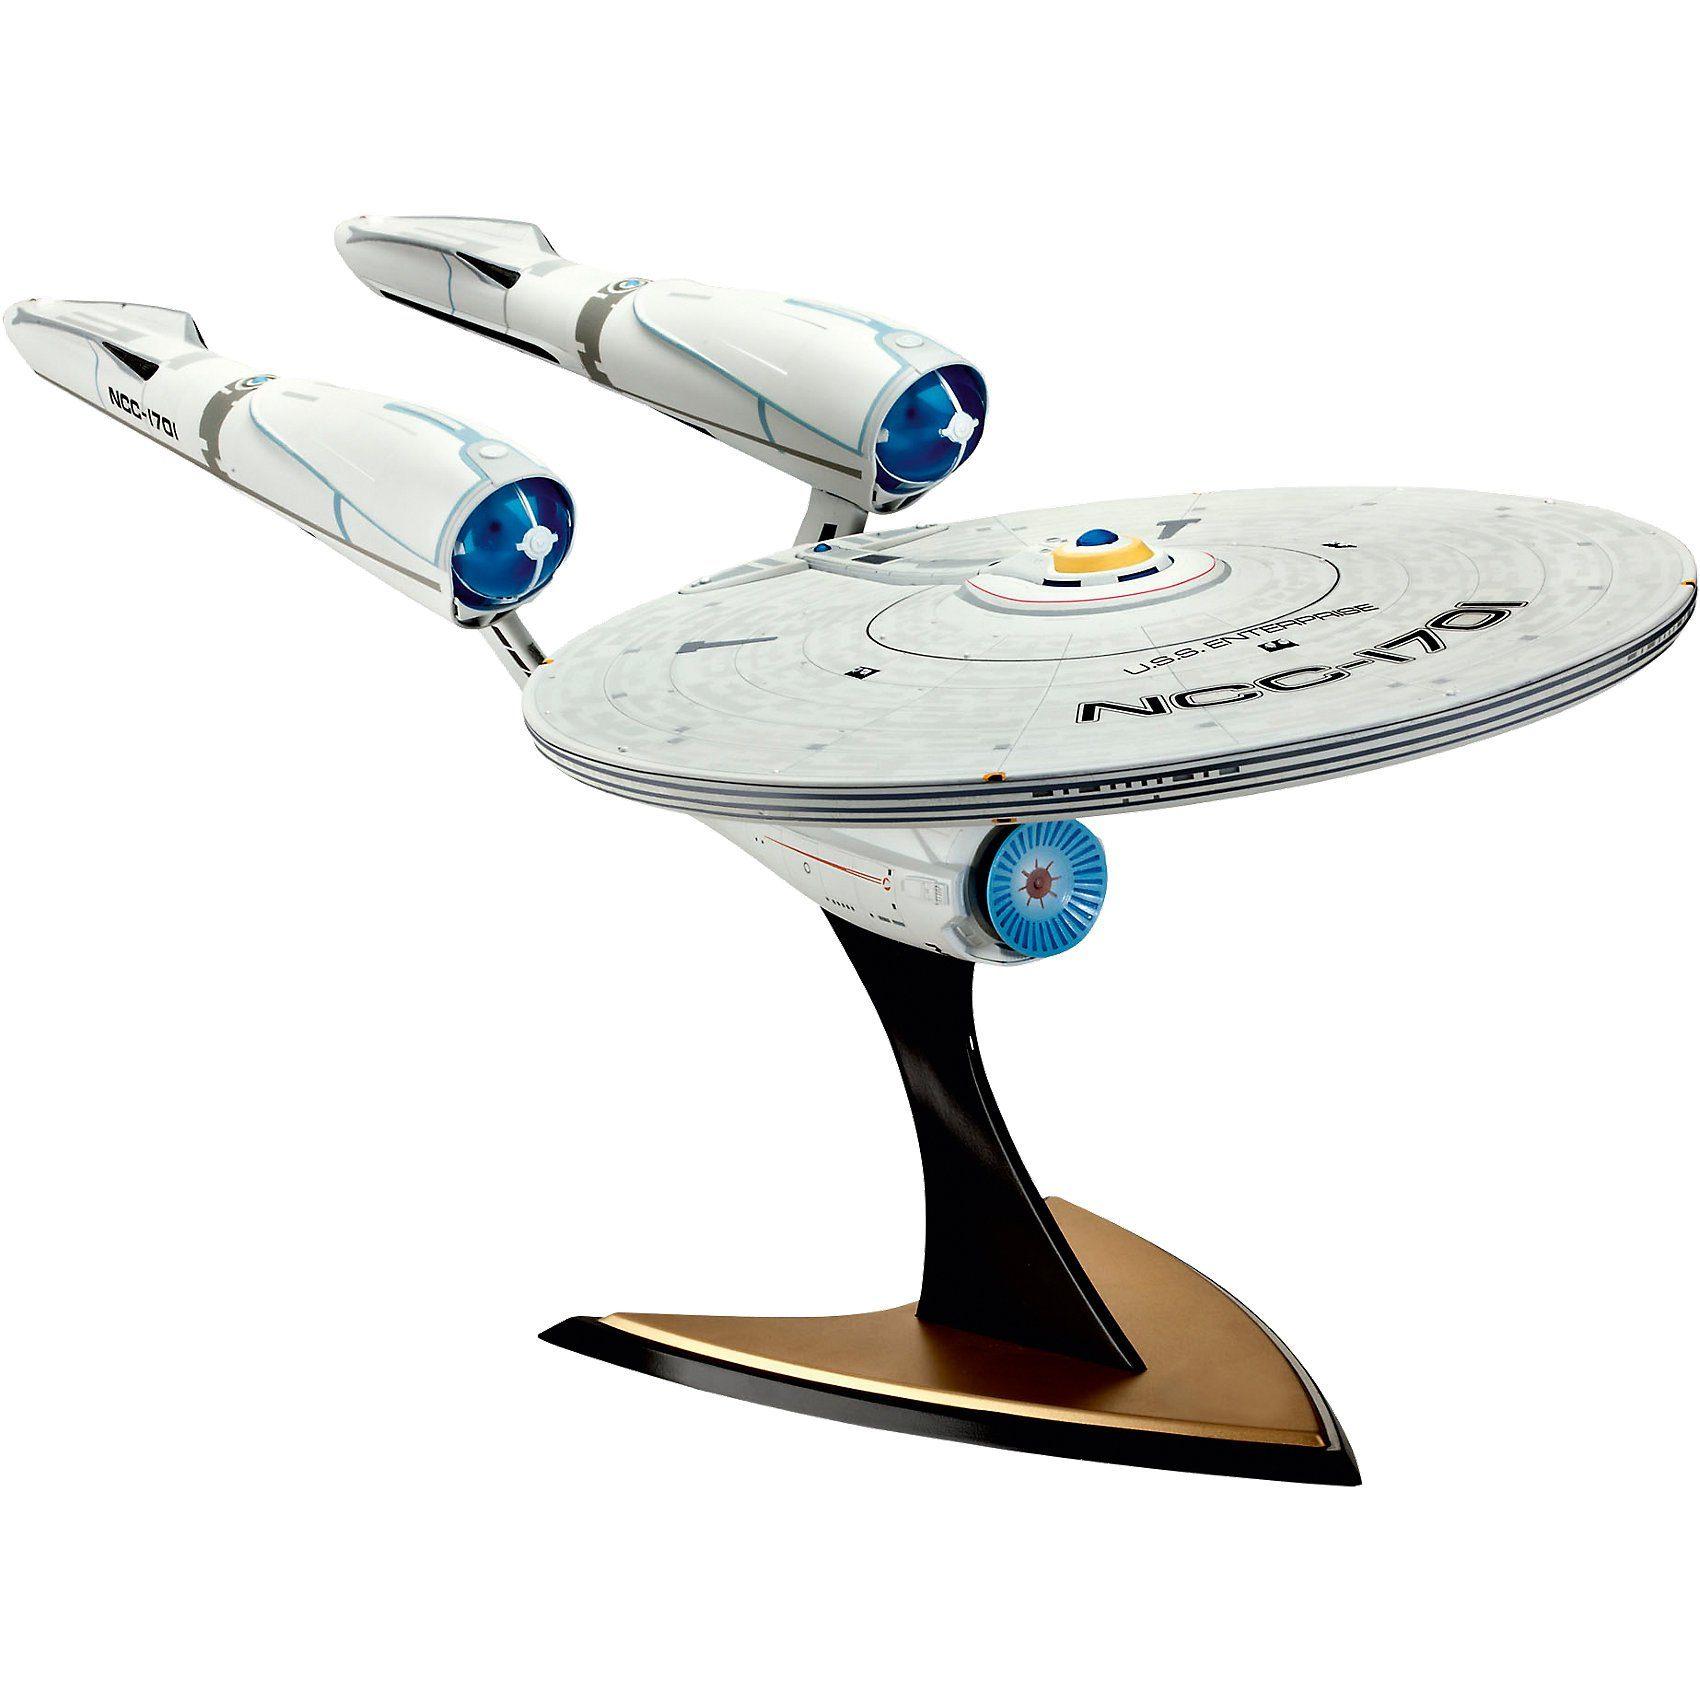 Revell Modellbausatz - U.S.S. Enterprise NCC-1701